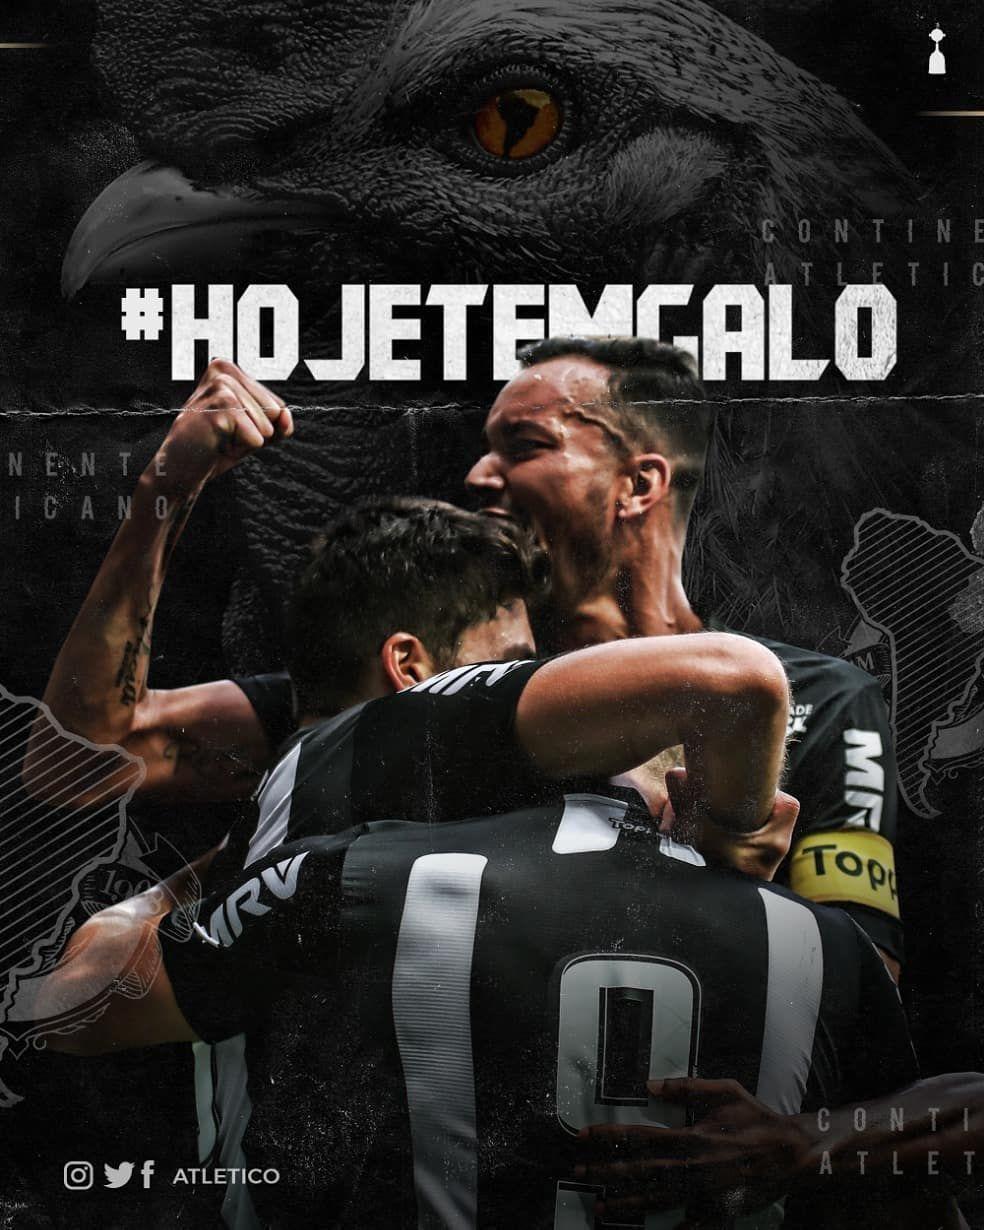 Hoje Tem Gaaaallooooo Vamos Em Busca Da Vaga Na Fase De Grupos Da Libertadores Defensorsp Atletico Libertado Atletico Clube Atletico Mineiro Clube